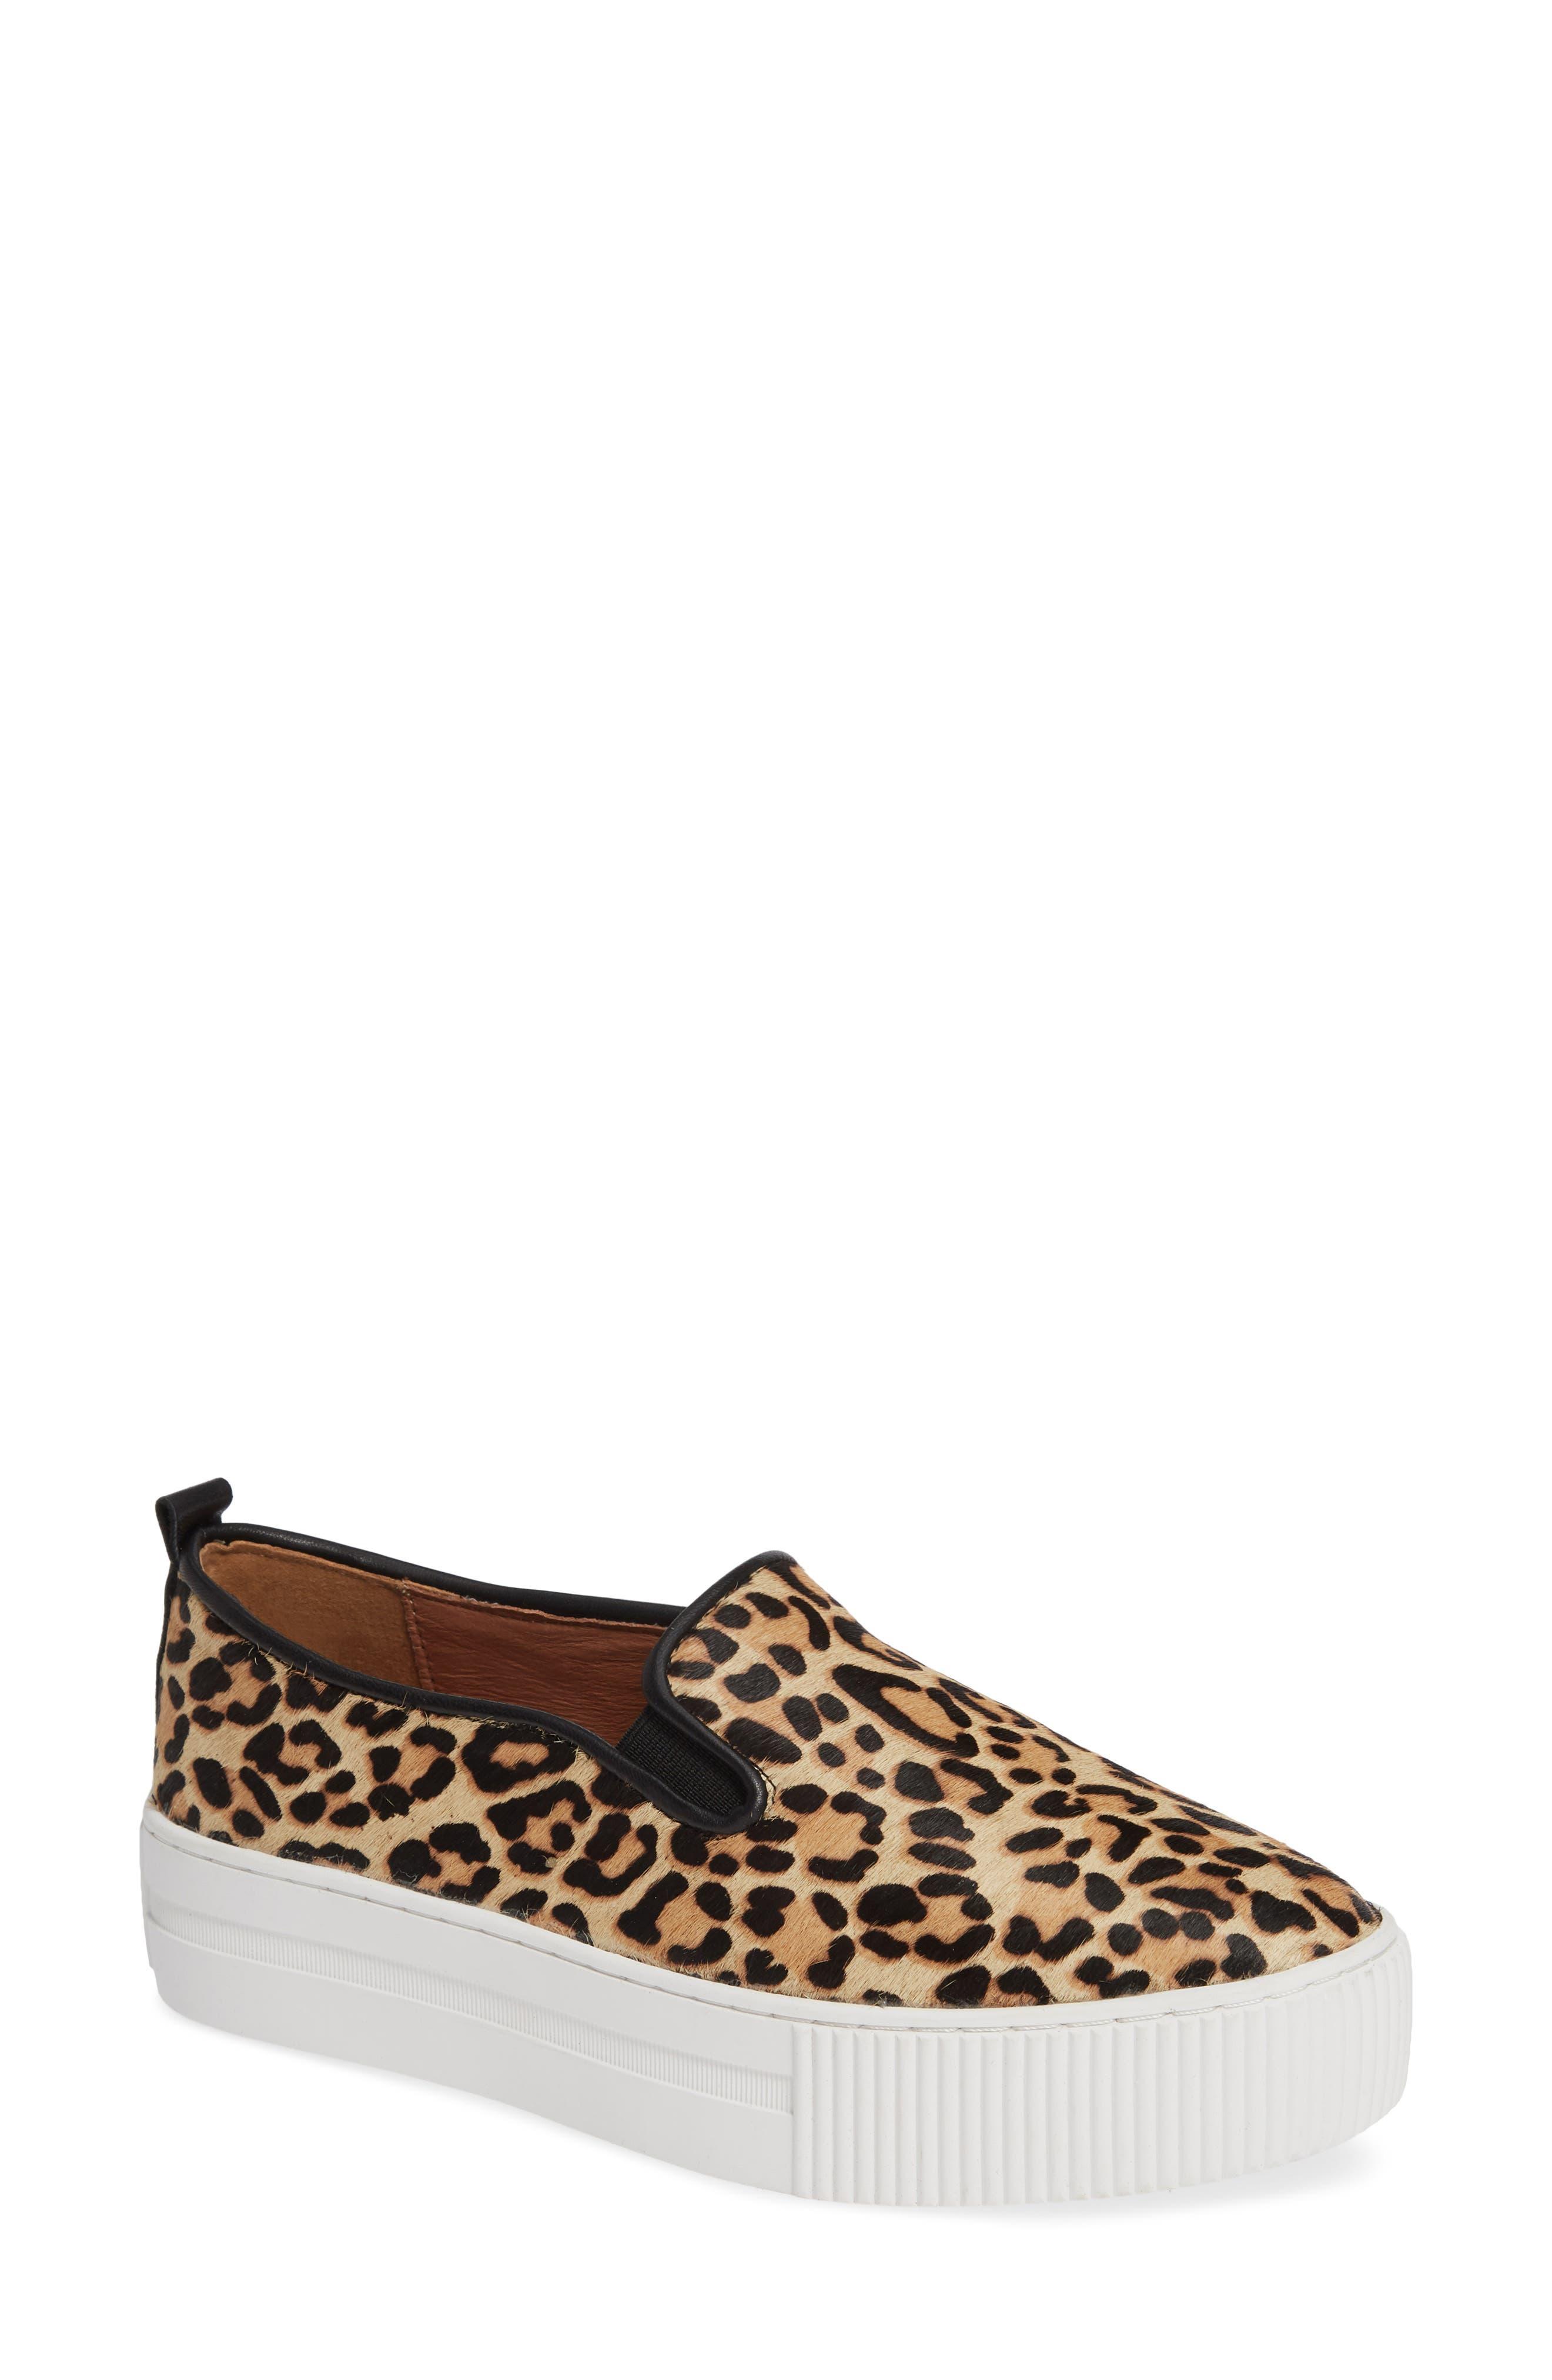 Baylee Platform Slip-On Sneaker, Main, color, LEOPARD HAIRCALF